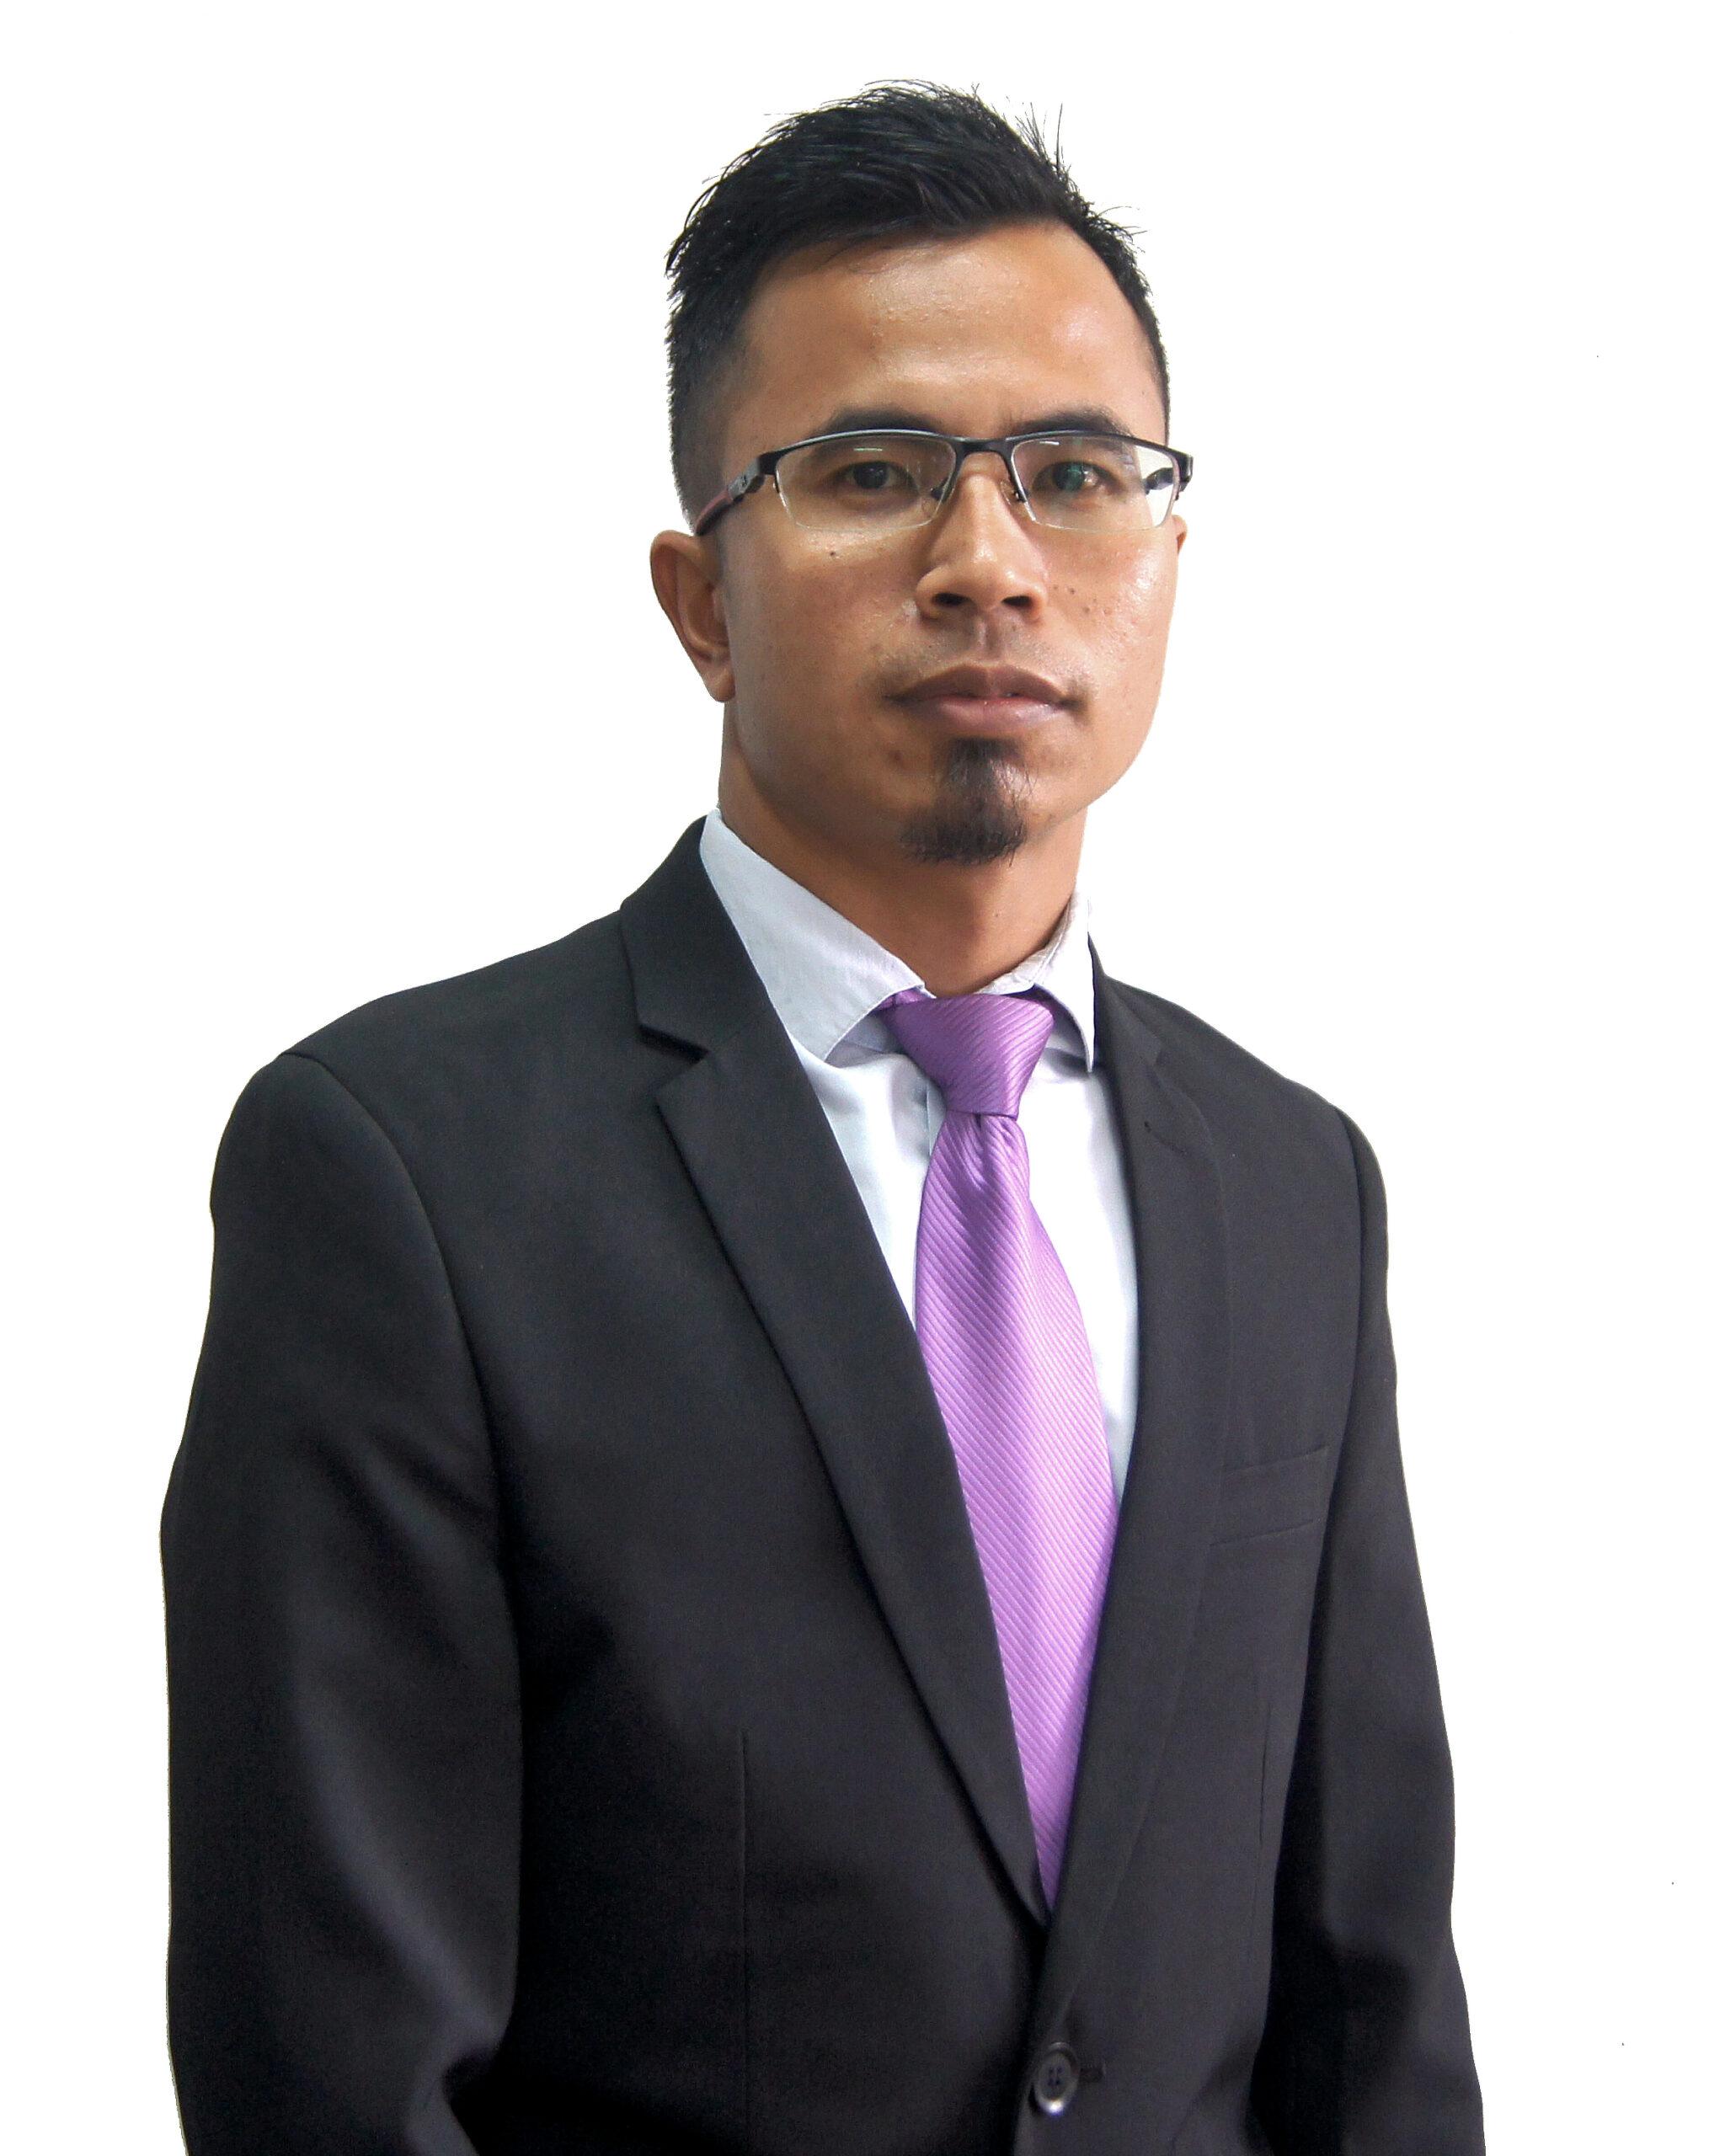 Muhamad Arif Bin Abdul Aziz